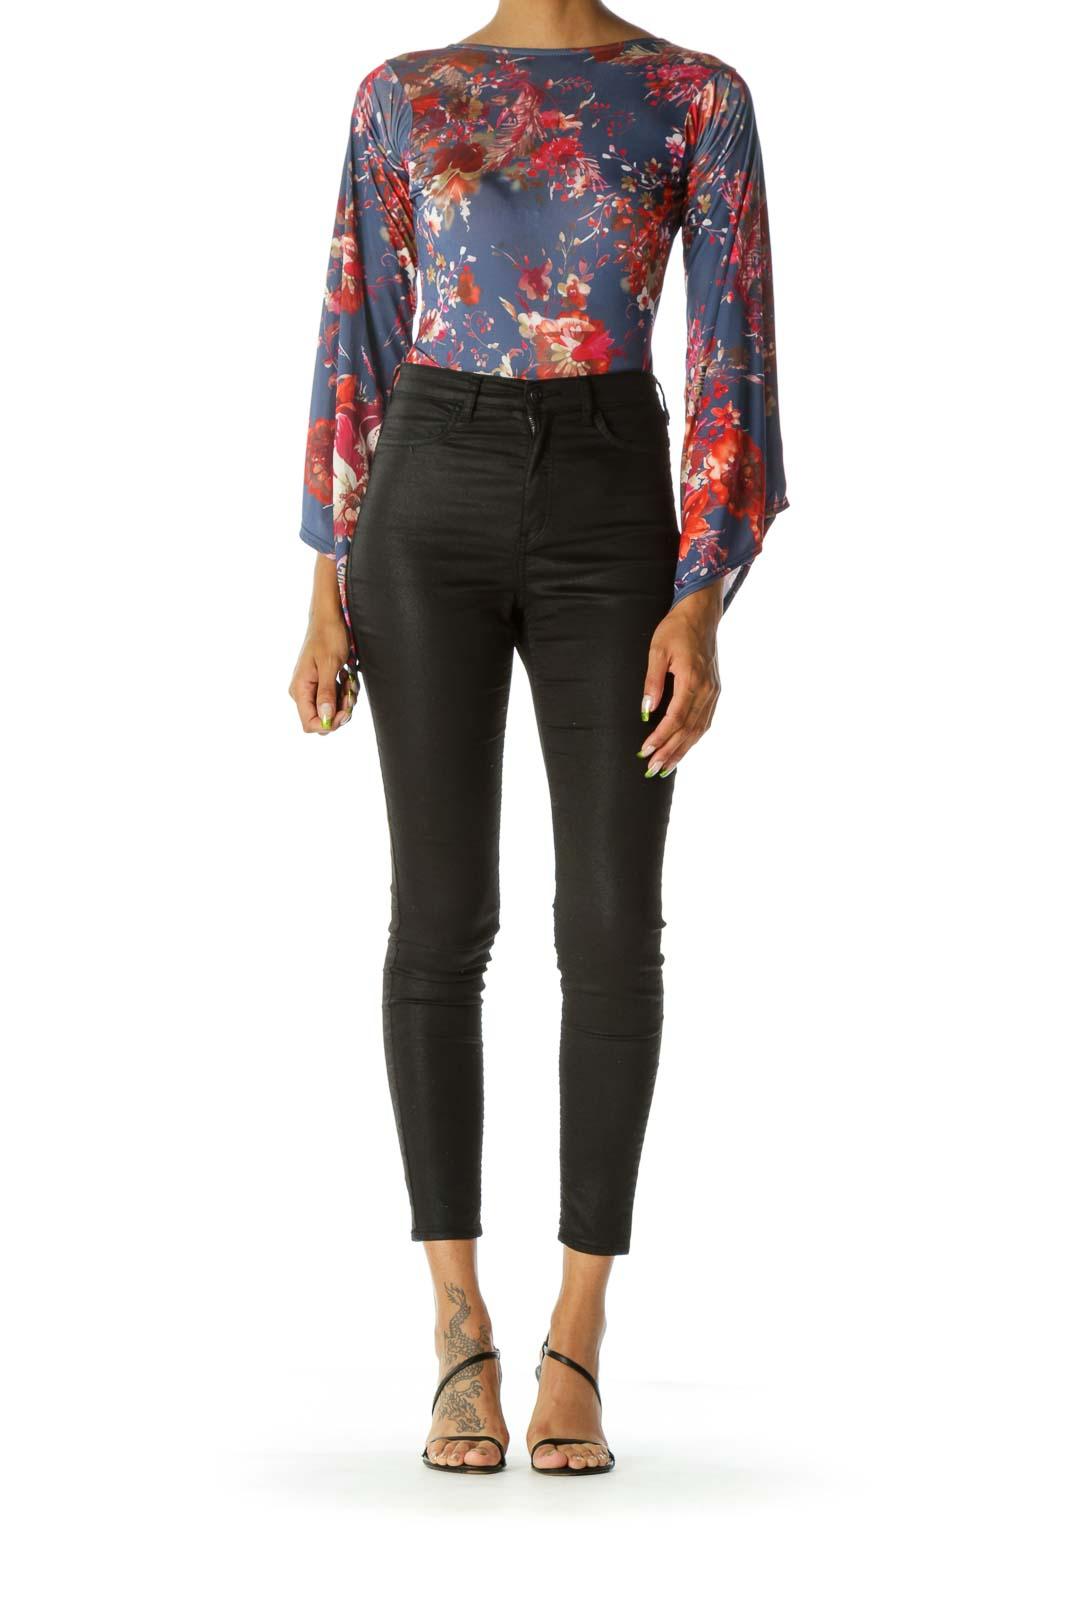 Blue Red & Gold Floral-Print Open-Back Bell-Sleeve Bodysuit